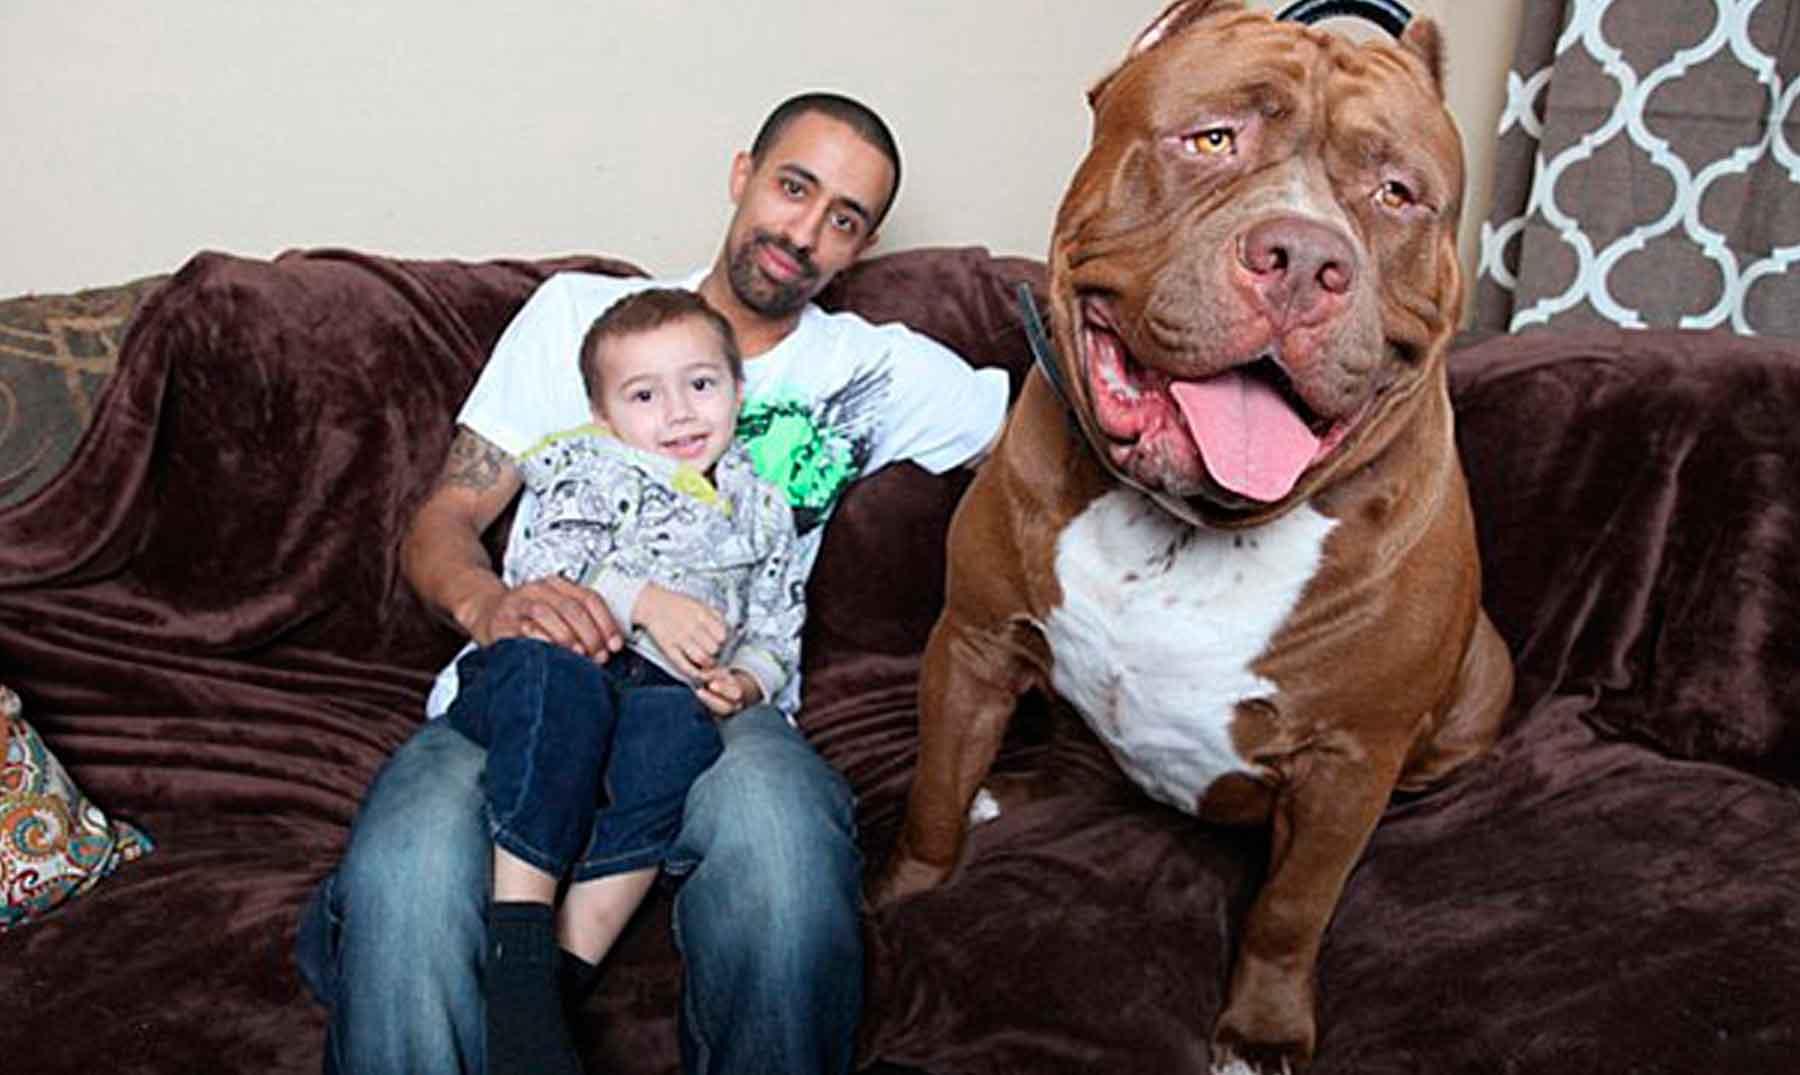 hulk el perro gigante de m s de 78 kg de peso. Black Bedroom Furniture Sets. Home Design Ideas